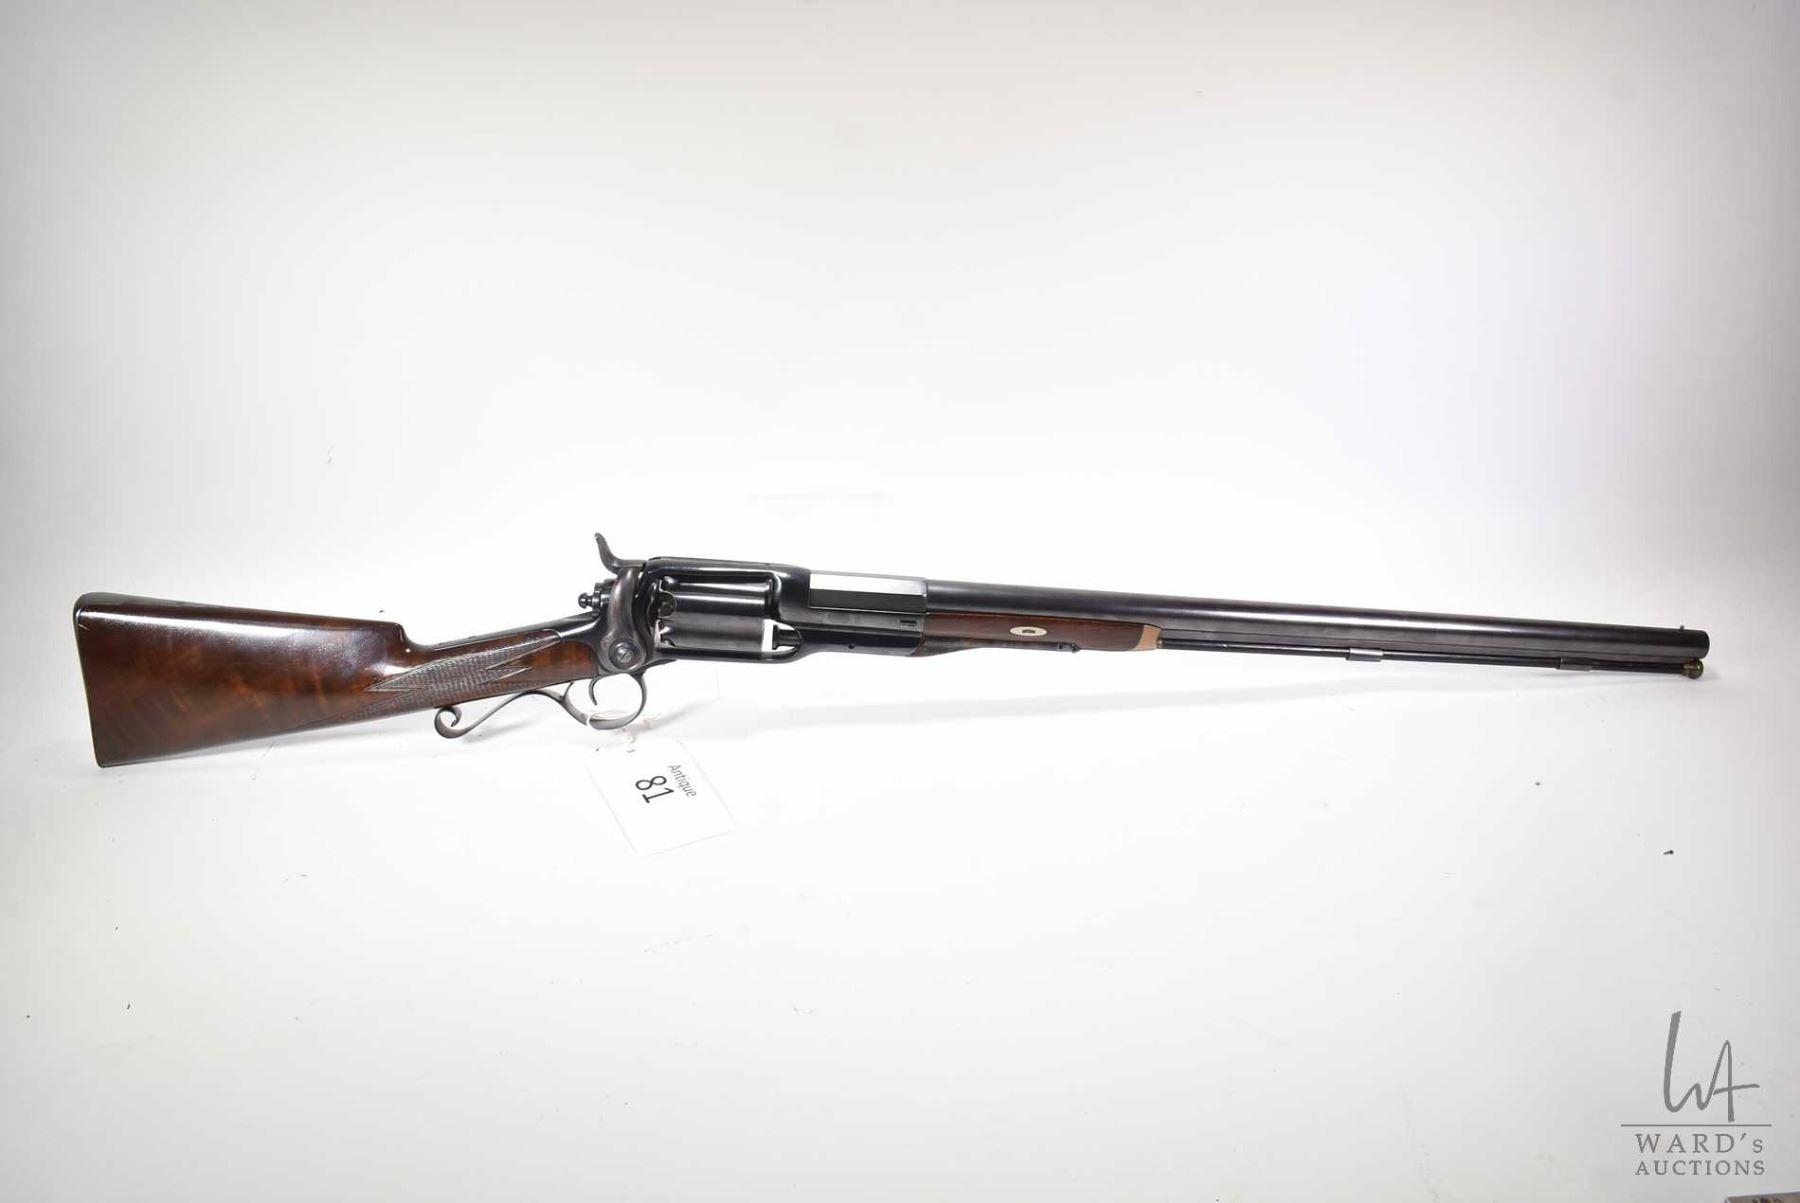 https://www.icollector.com/Antique-percussion-shotgun-Colt-model-1855-sidehammer-10-gauge-five-shot-single-action-w-bbl-leng_i37625040